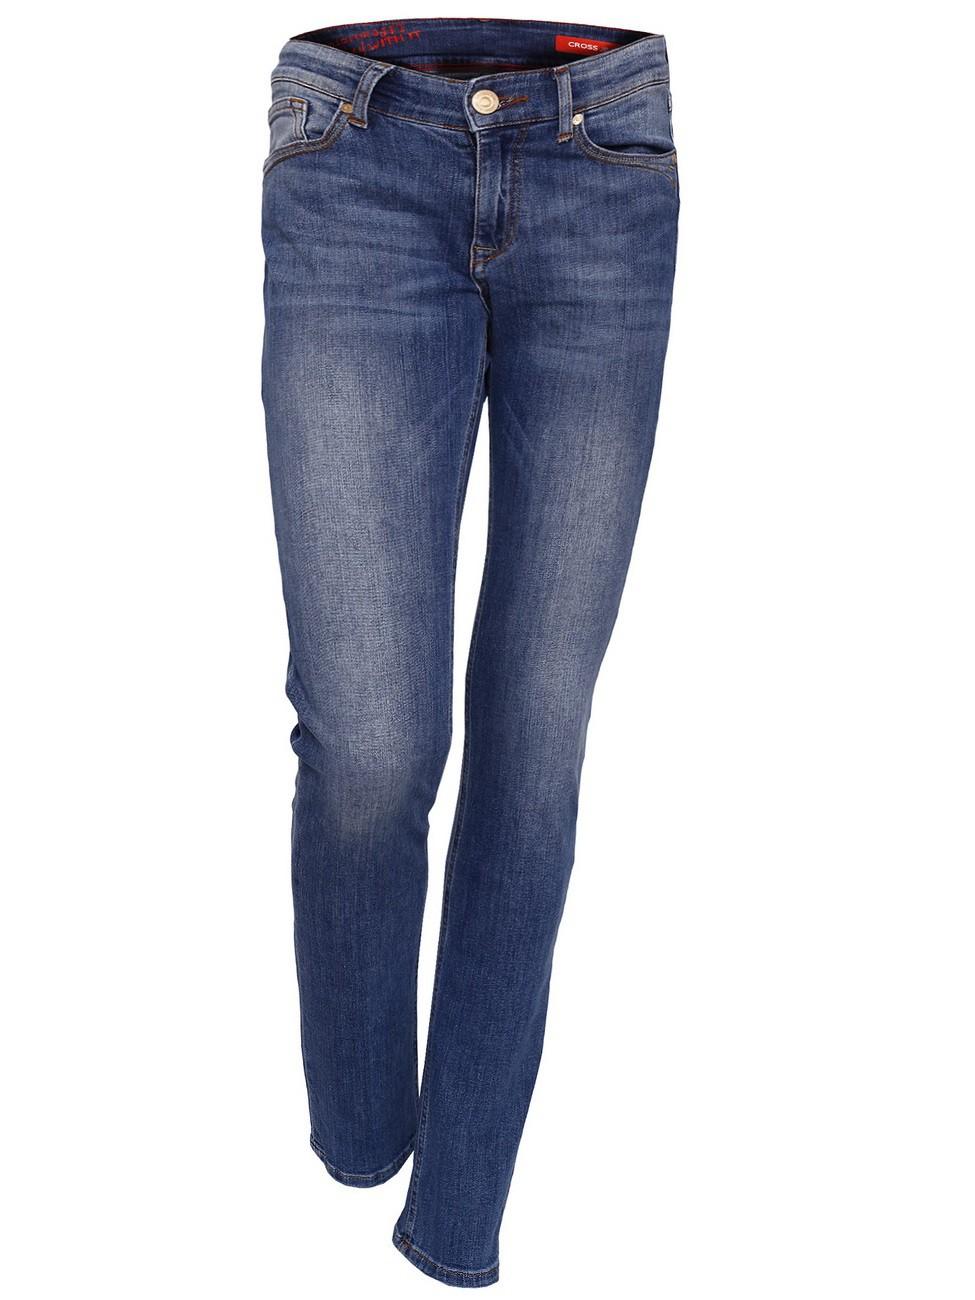 Cross Jeans Damen Jeans Anya - Slim Fit - Blue Used